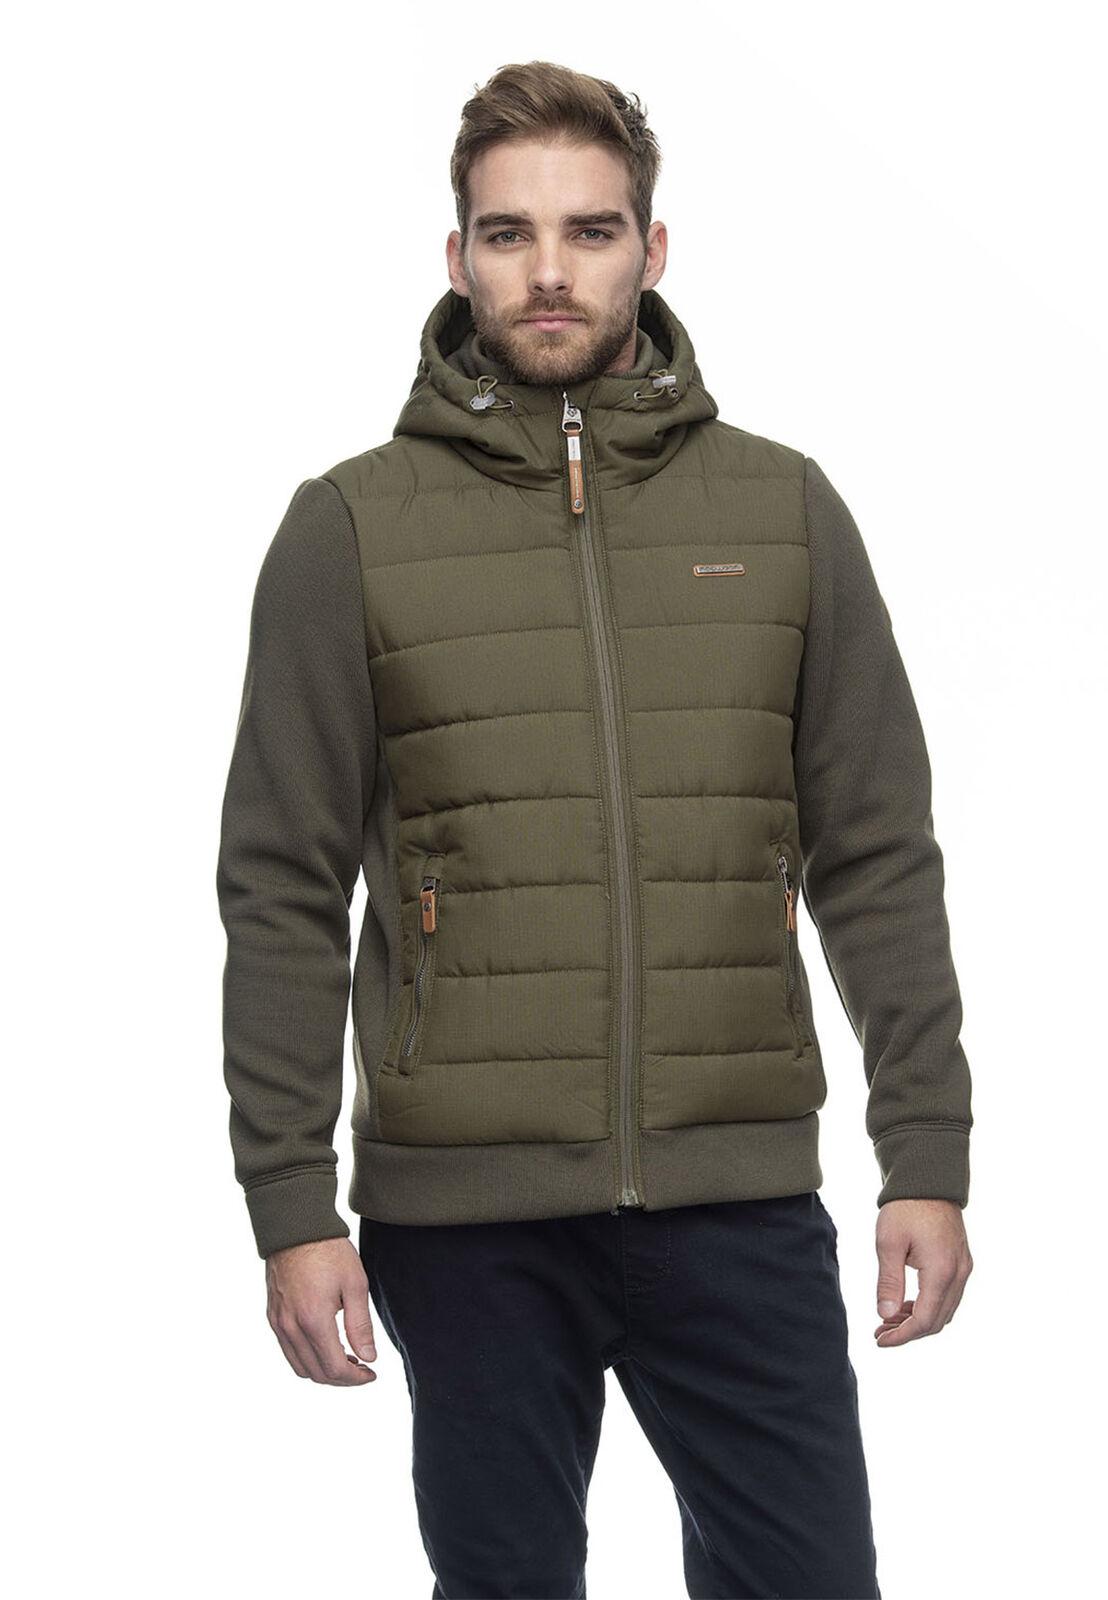 Ragwear chaqueta señores doryan 2022-60015 verde aceituna 5031